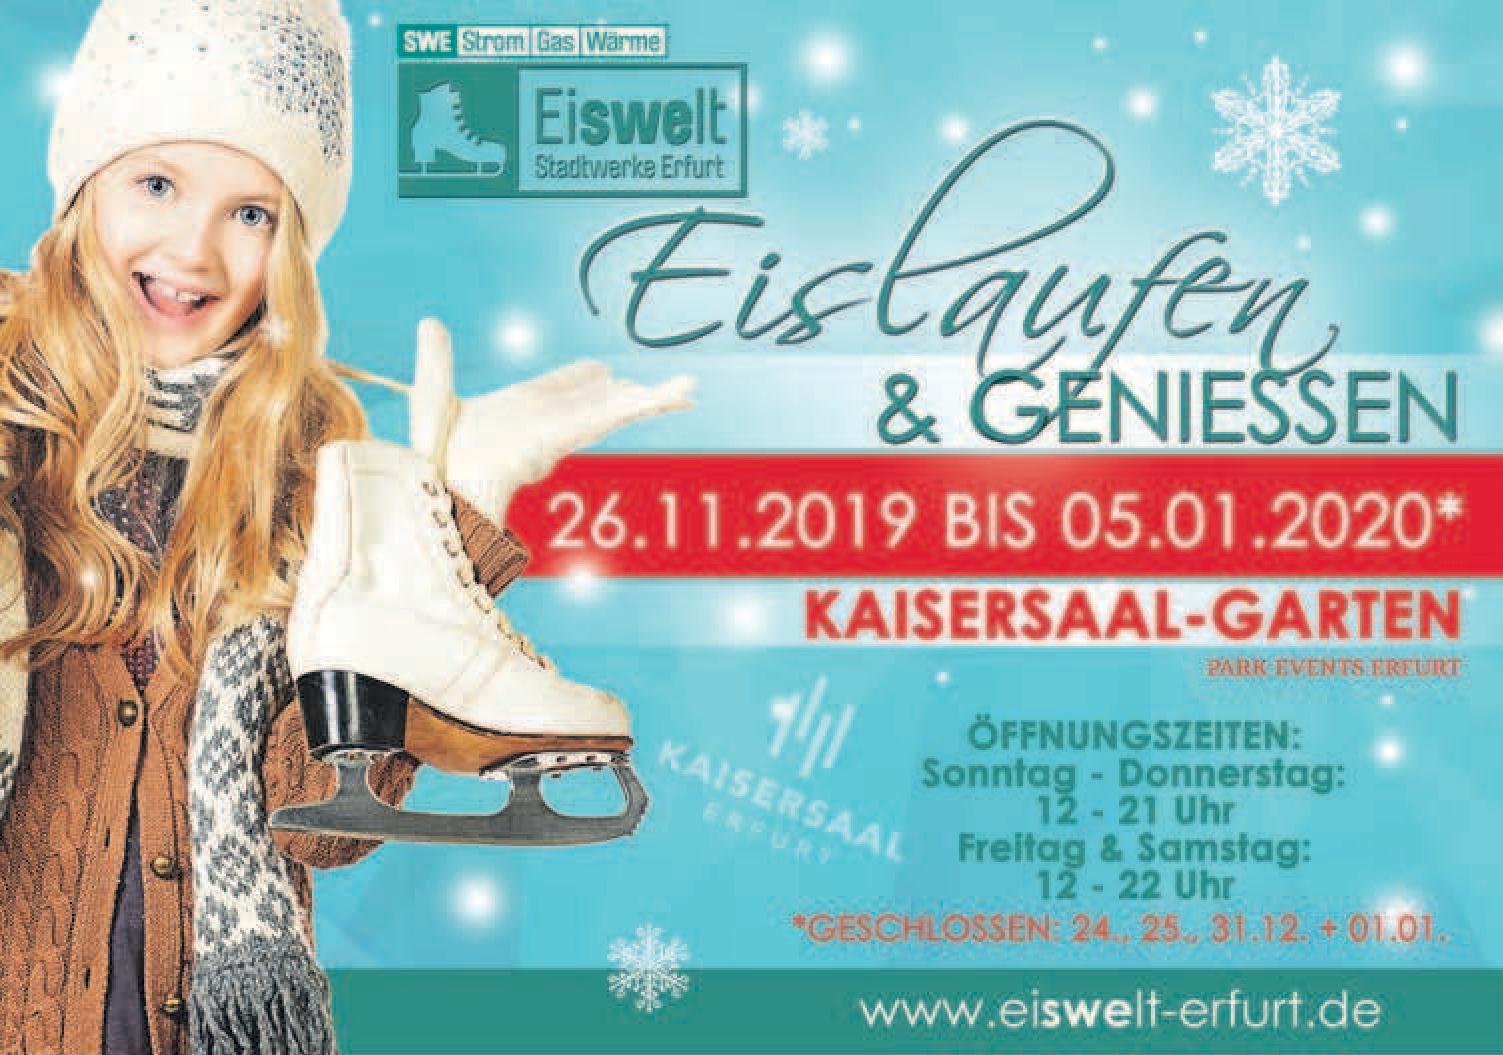 Eiswelt Stadtwerke Erfurt